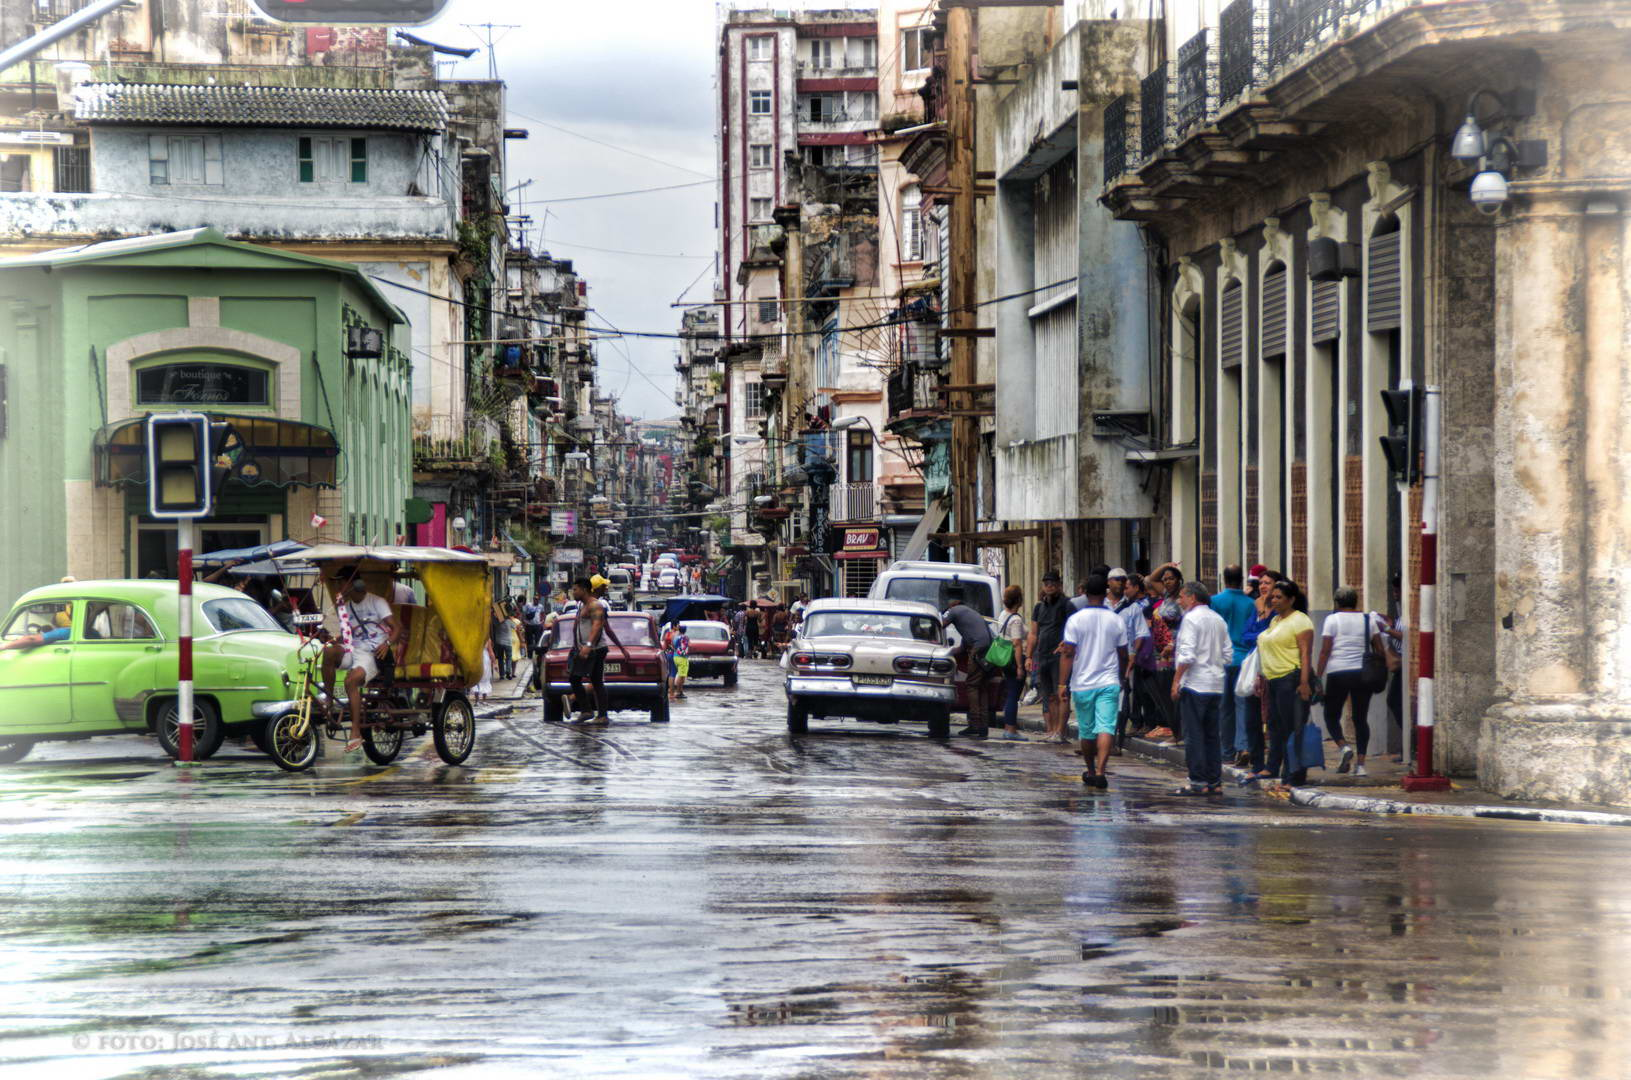 Calle transitada de La Habana